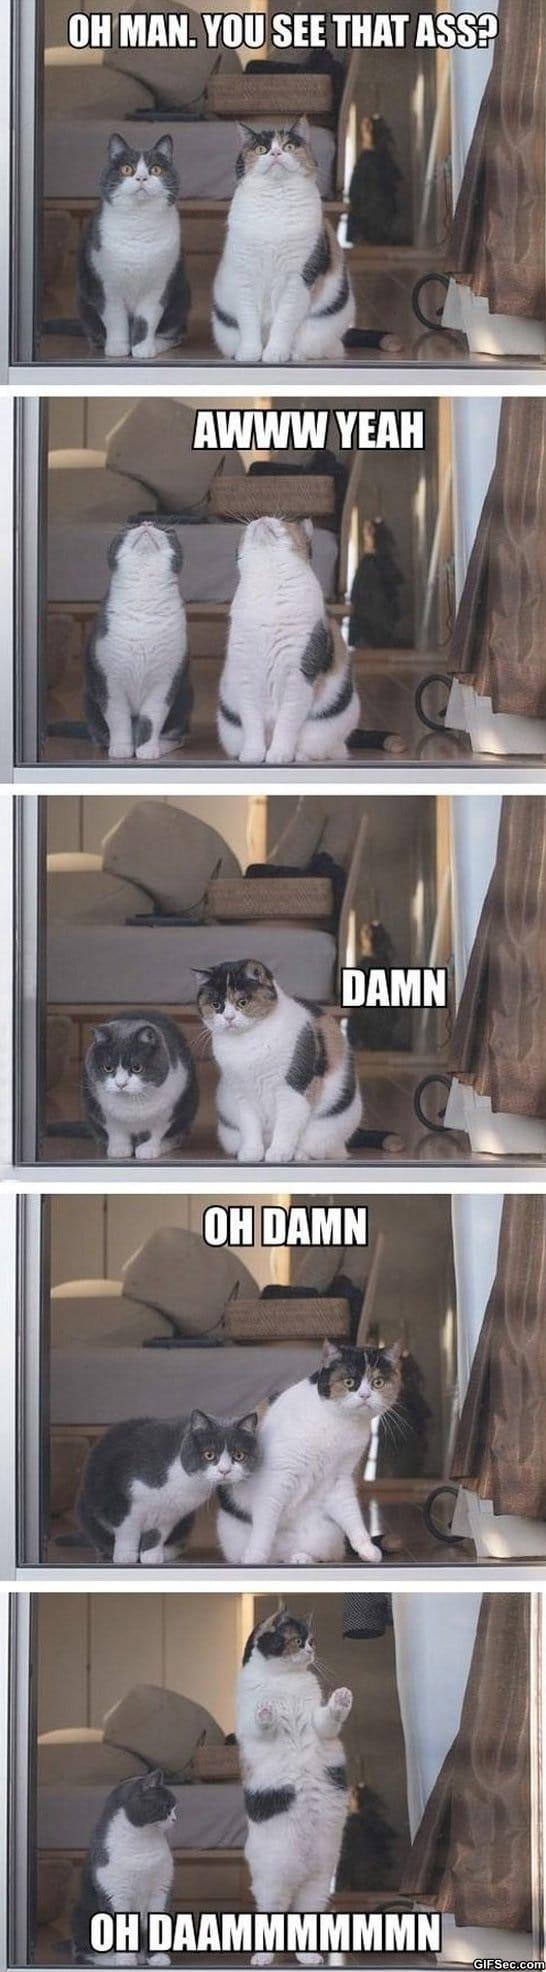 funny-pics-aw-yeah-meme